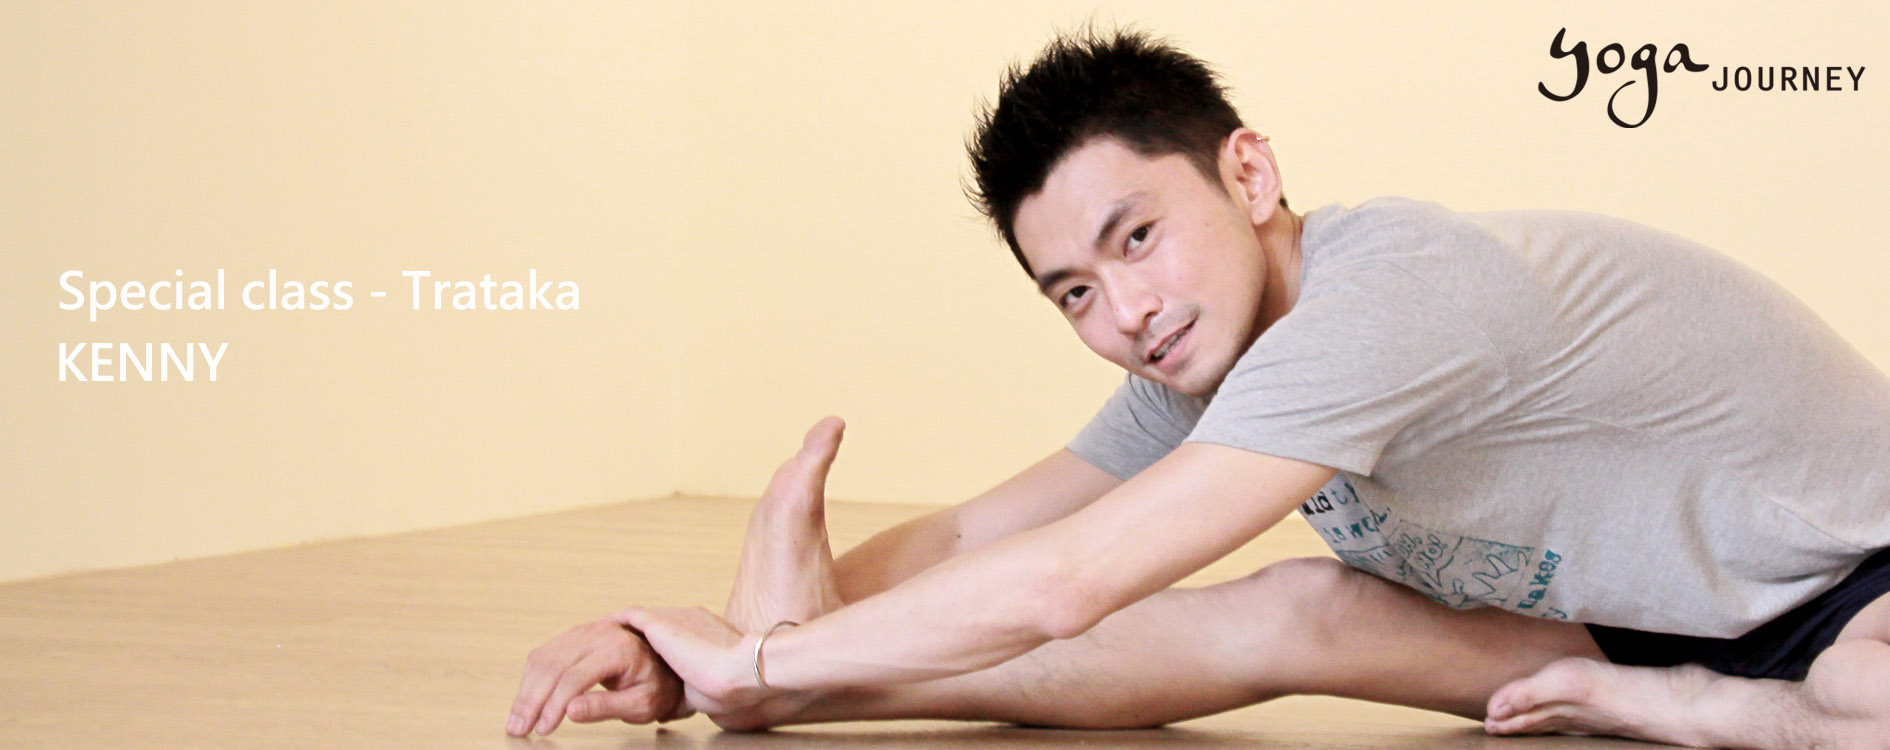 Yoga Journey special class